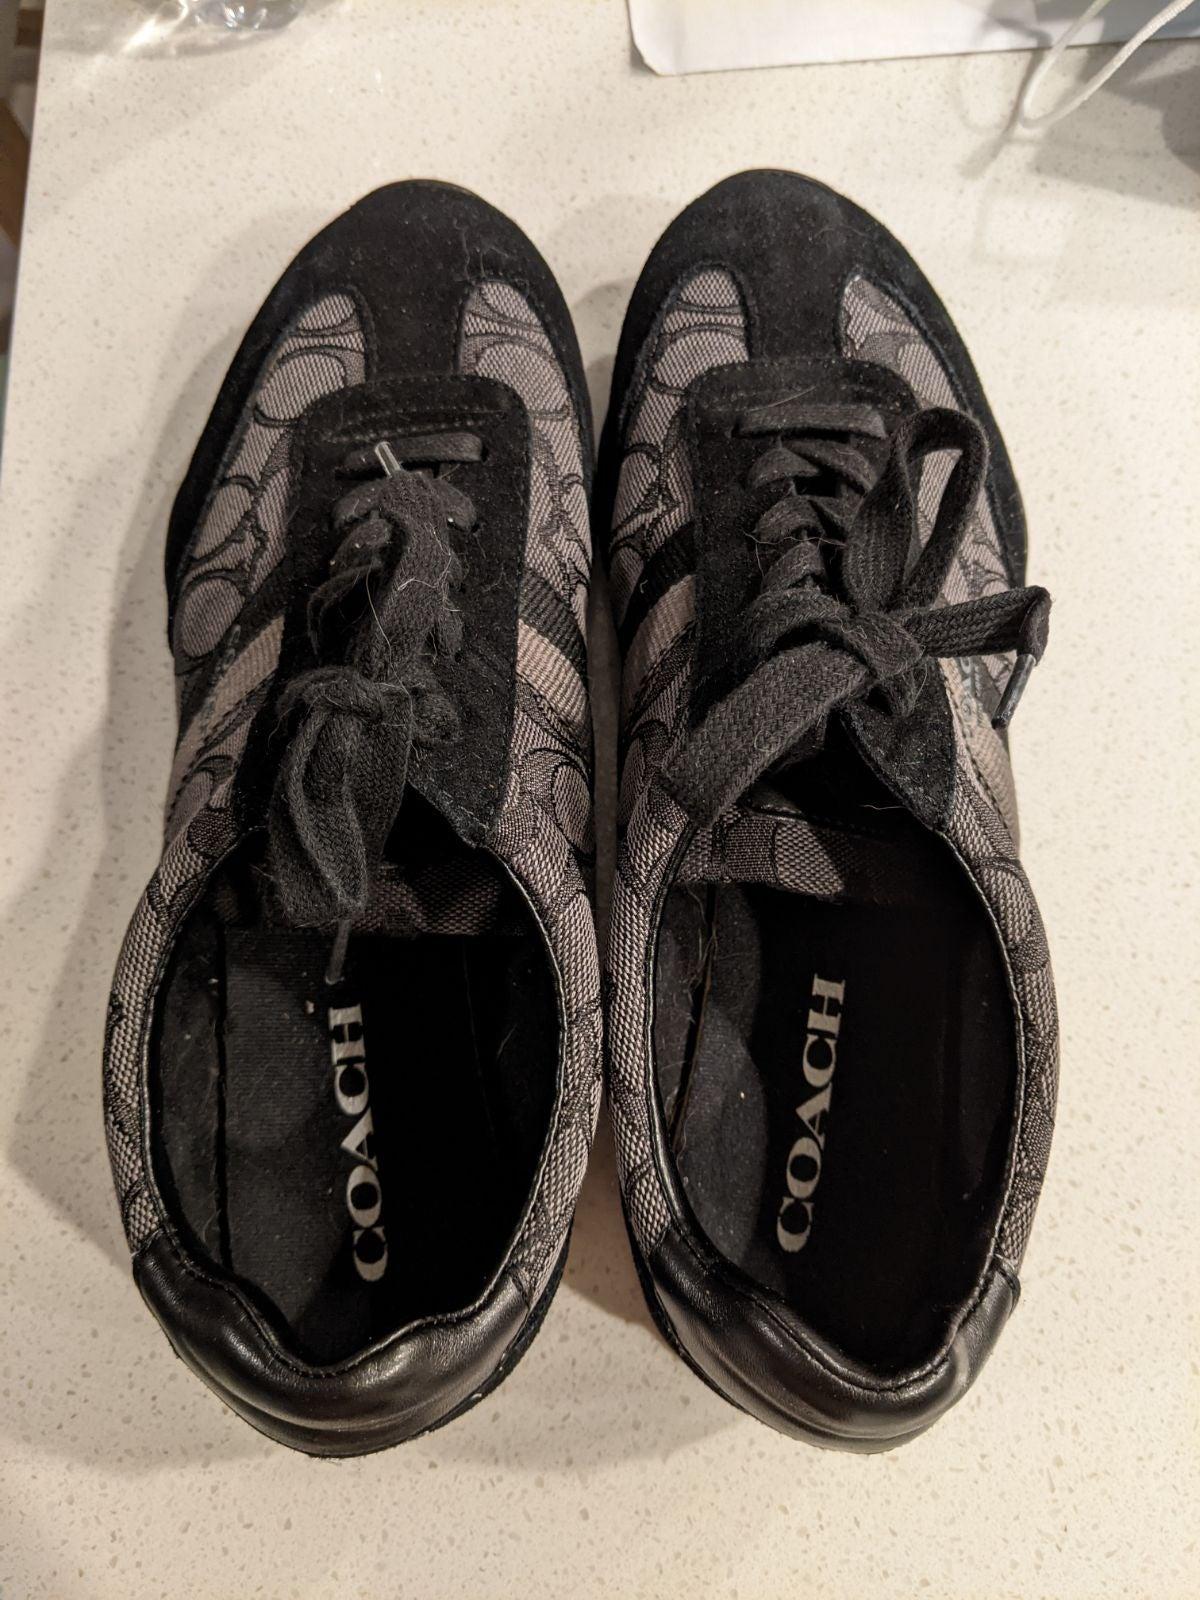 Coach Kelson tennis shoes 9